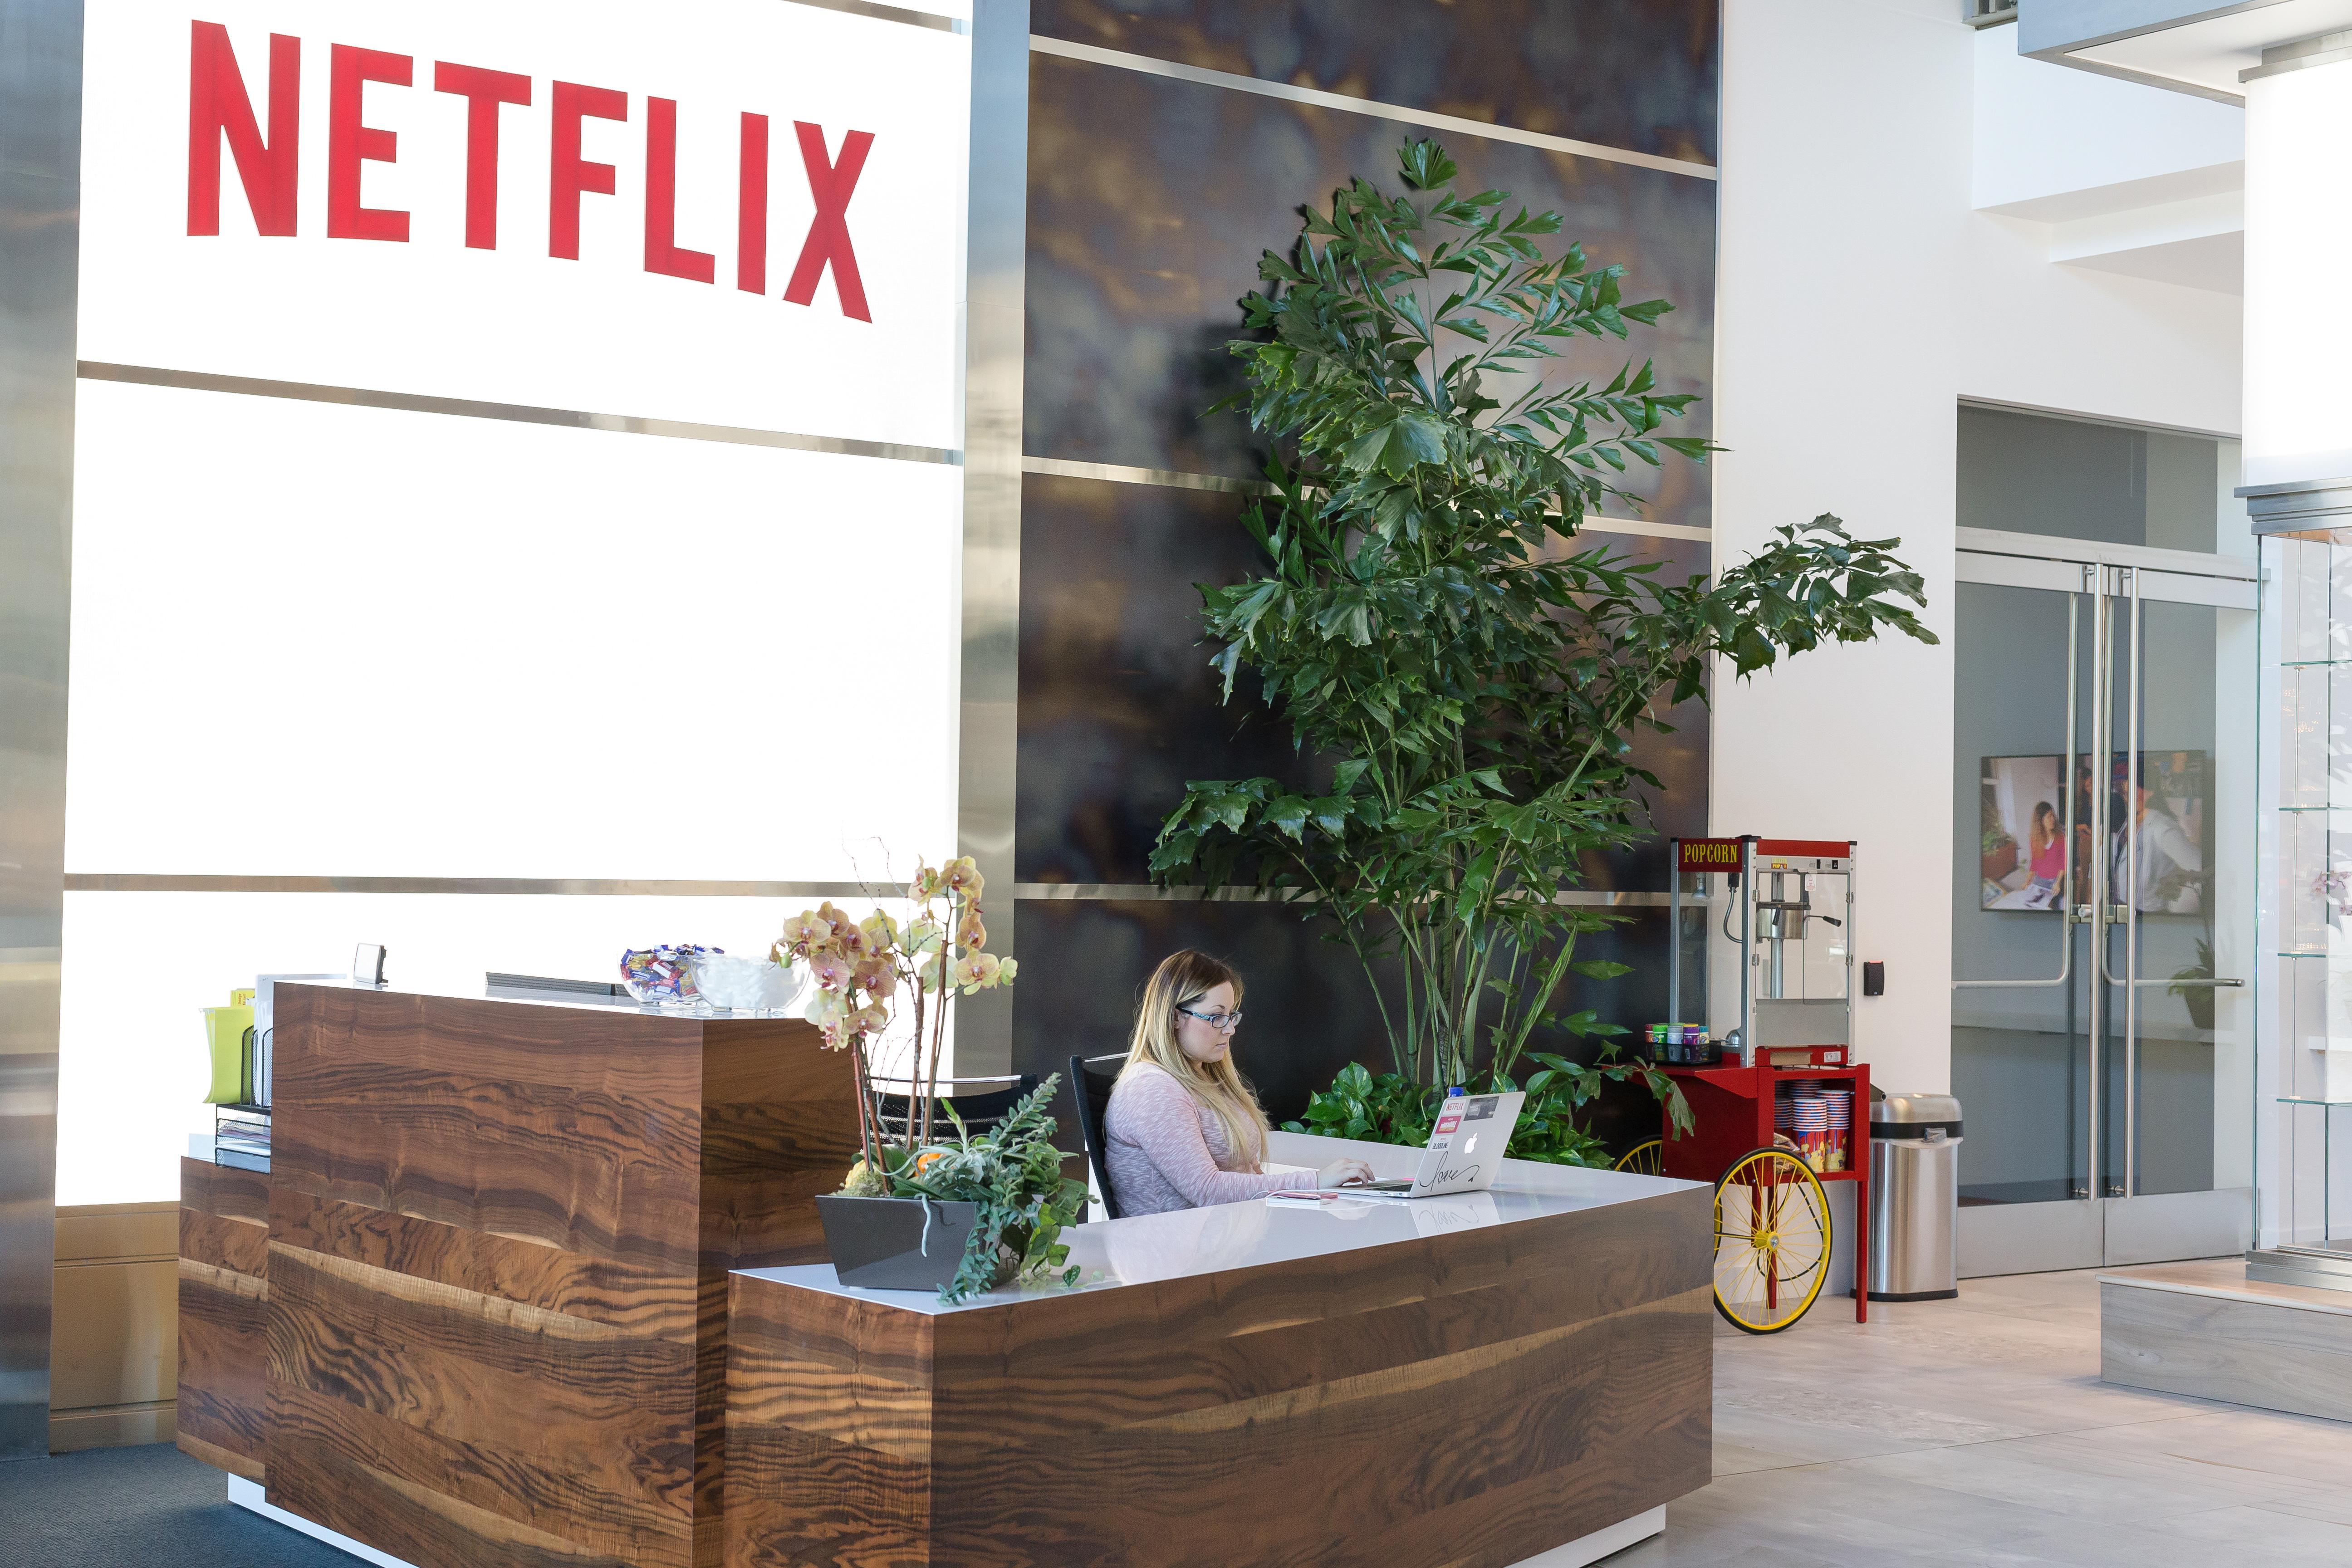 Receptionist at the Netflix headquarters